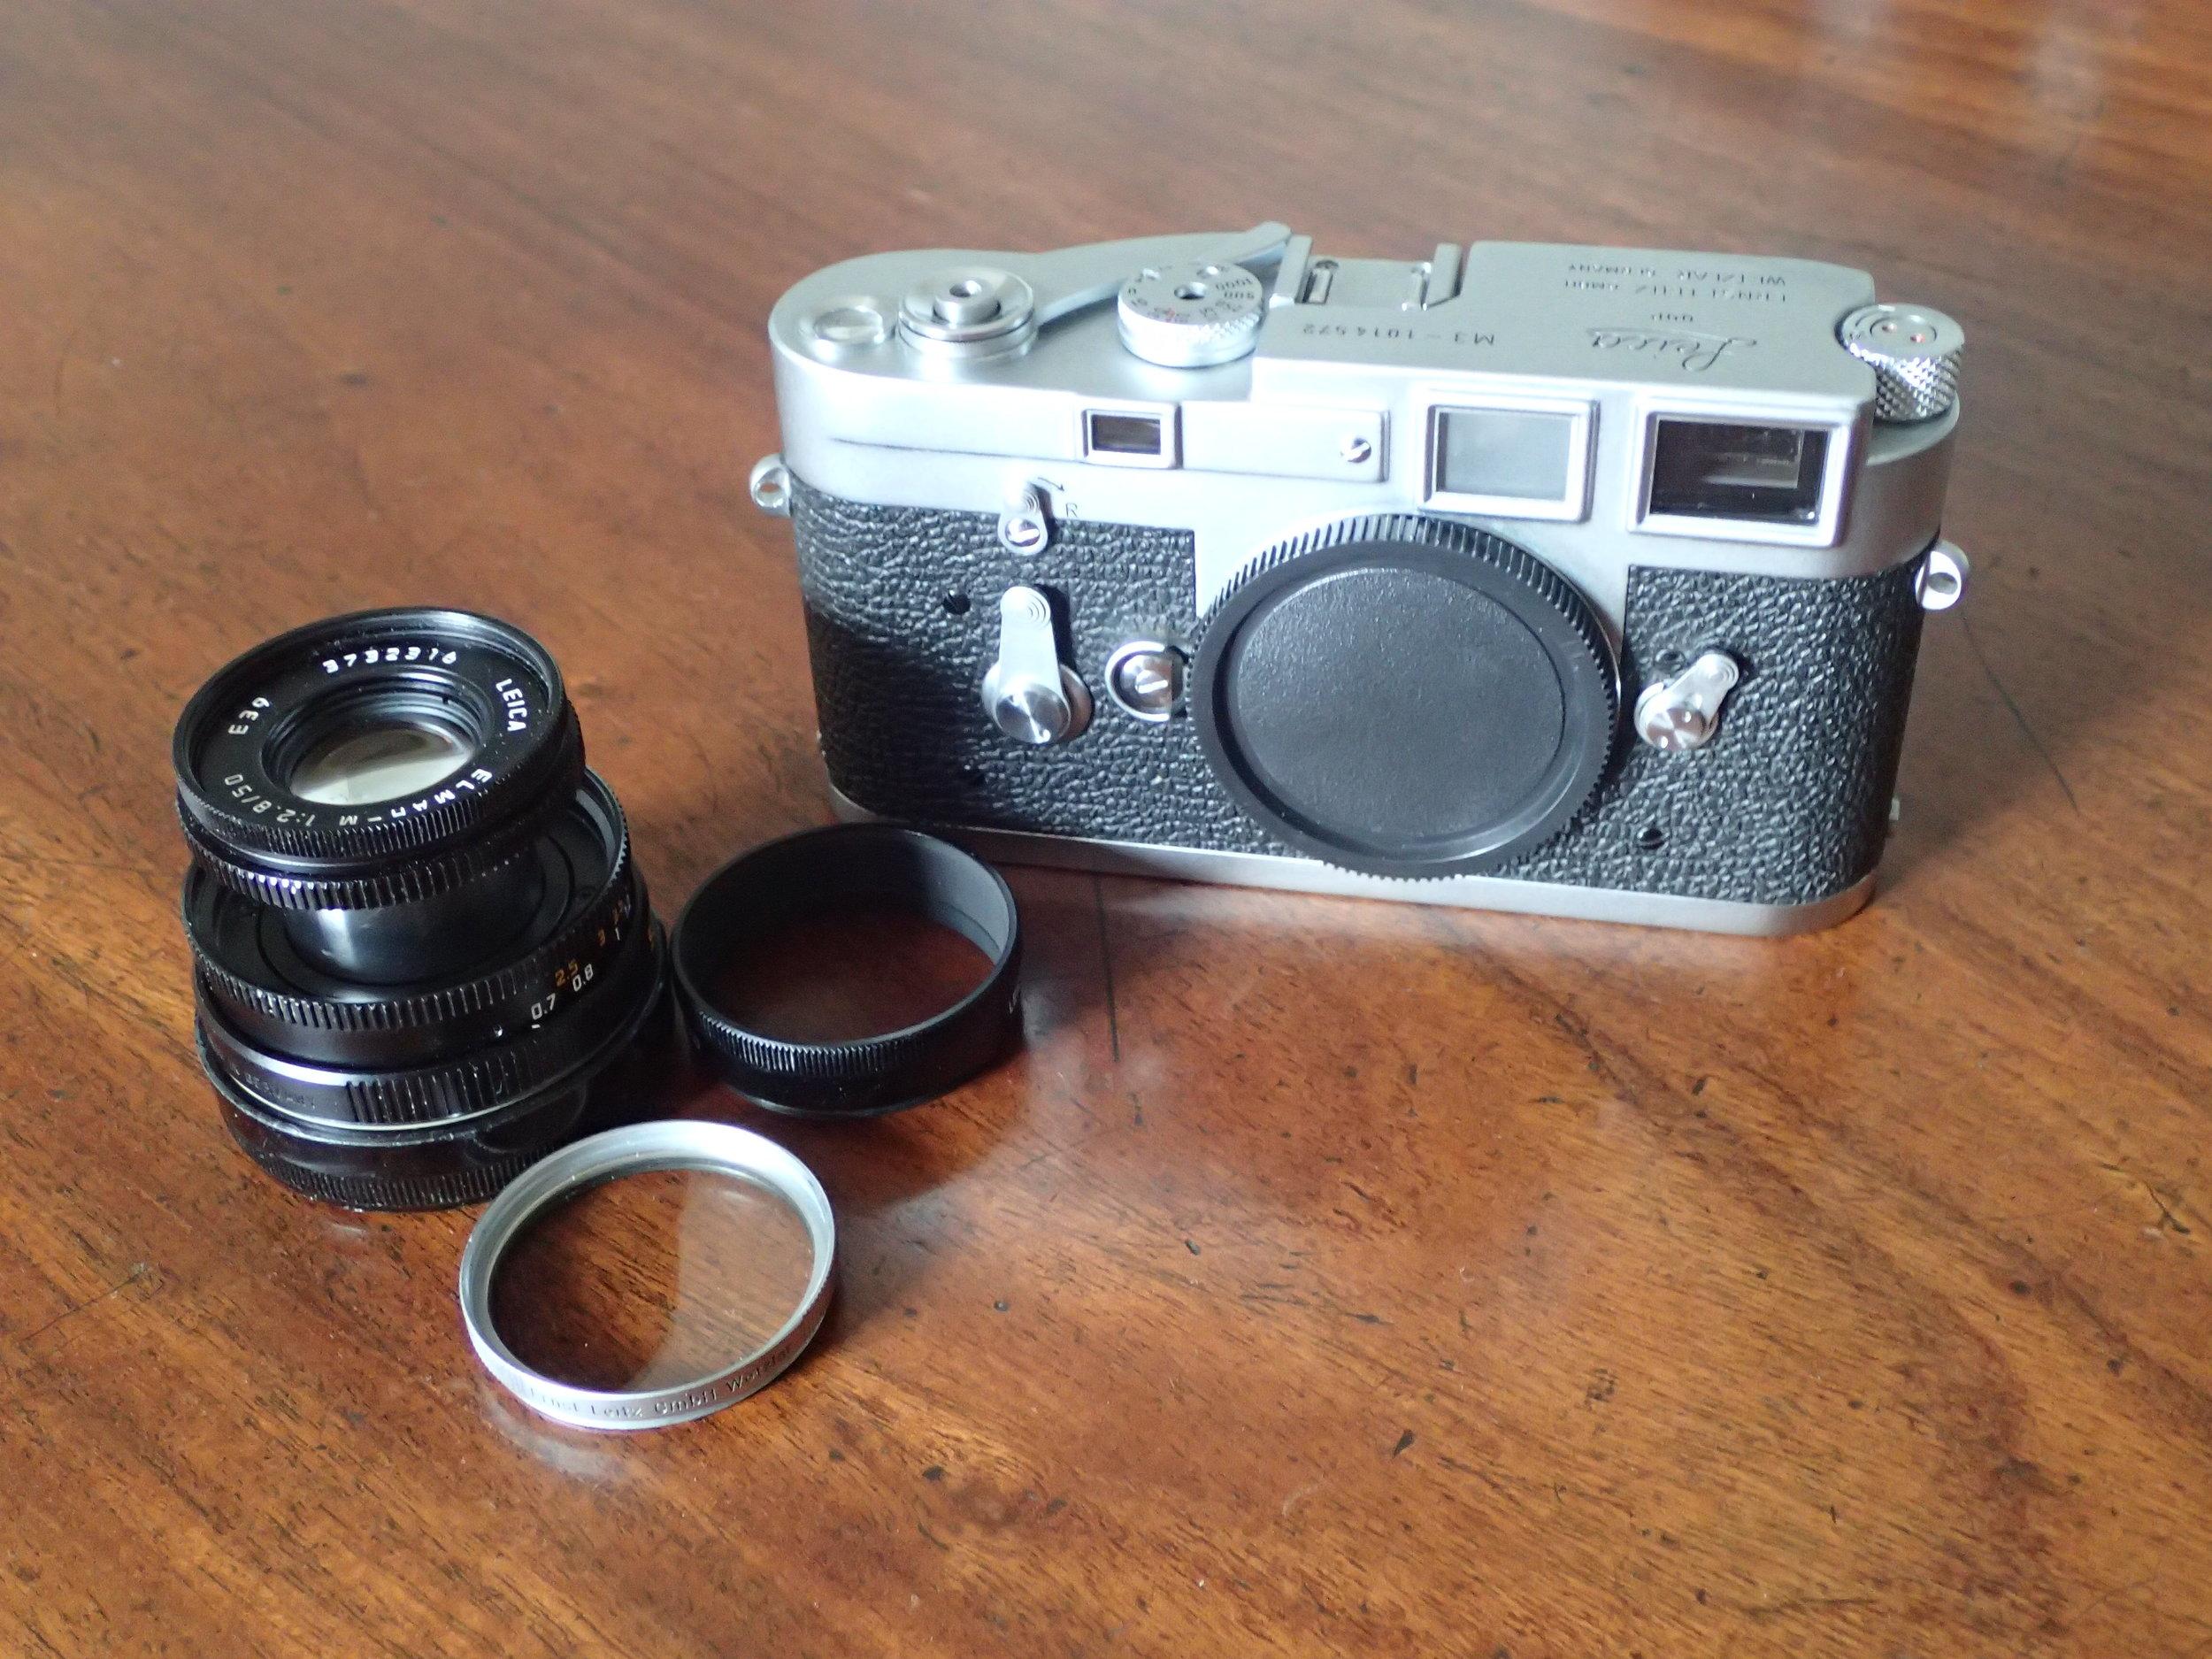 Leica M3, Leica Elmar-M 50 mm f2.8, Leica UVa filter.